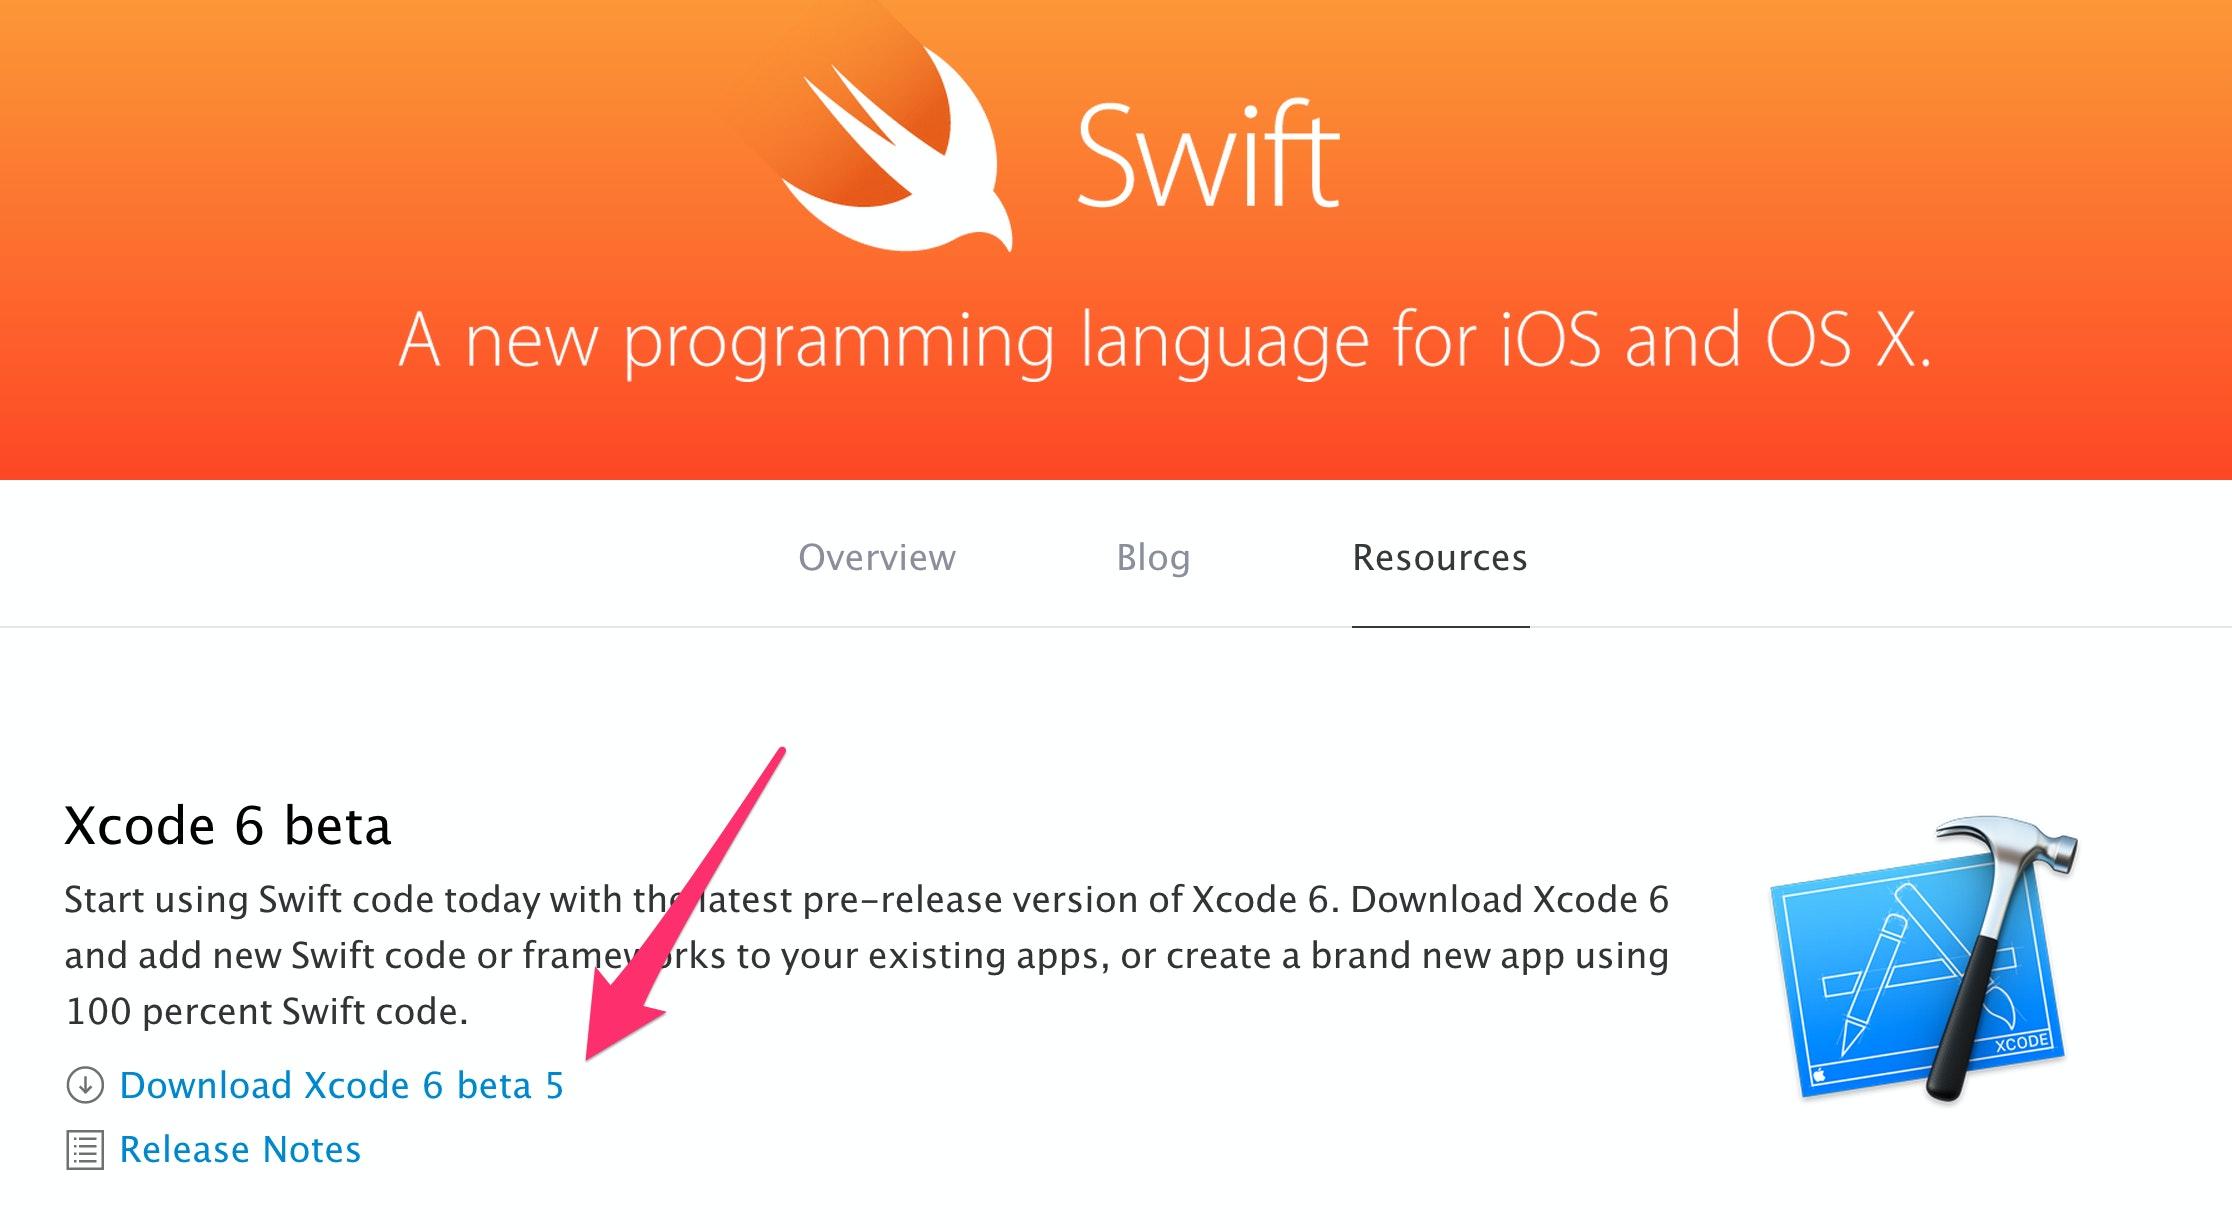 Swift_-_Resources_-_Apple_Developer.jpg